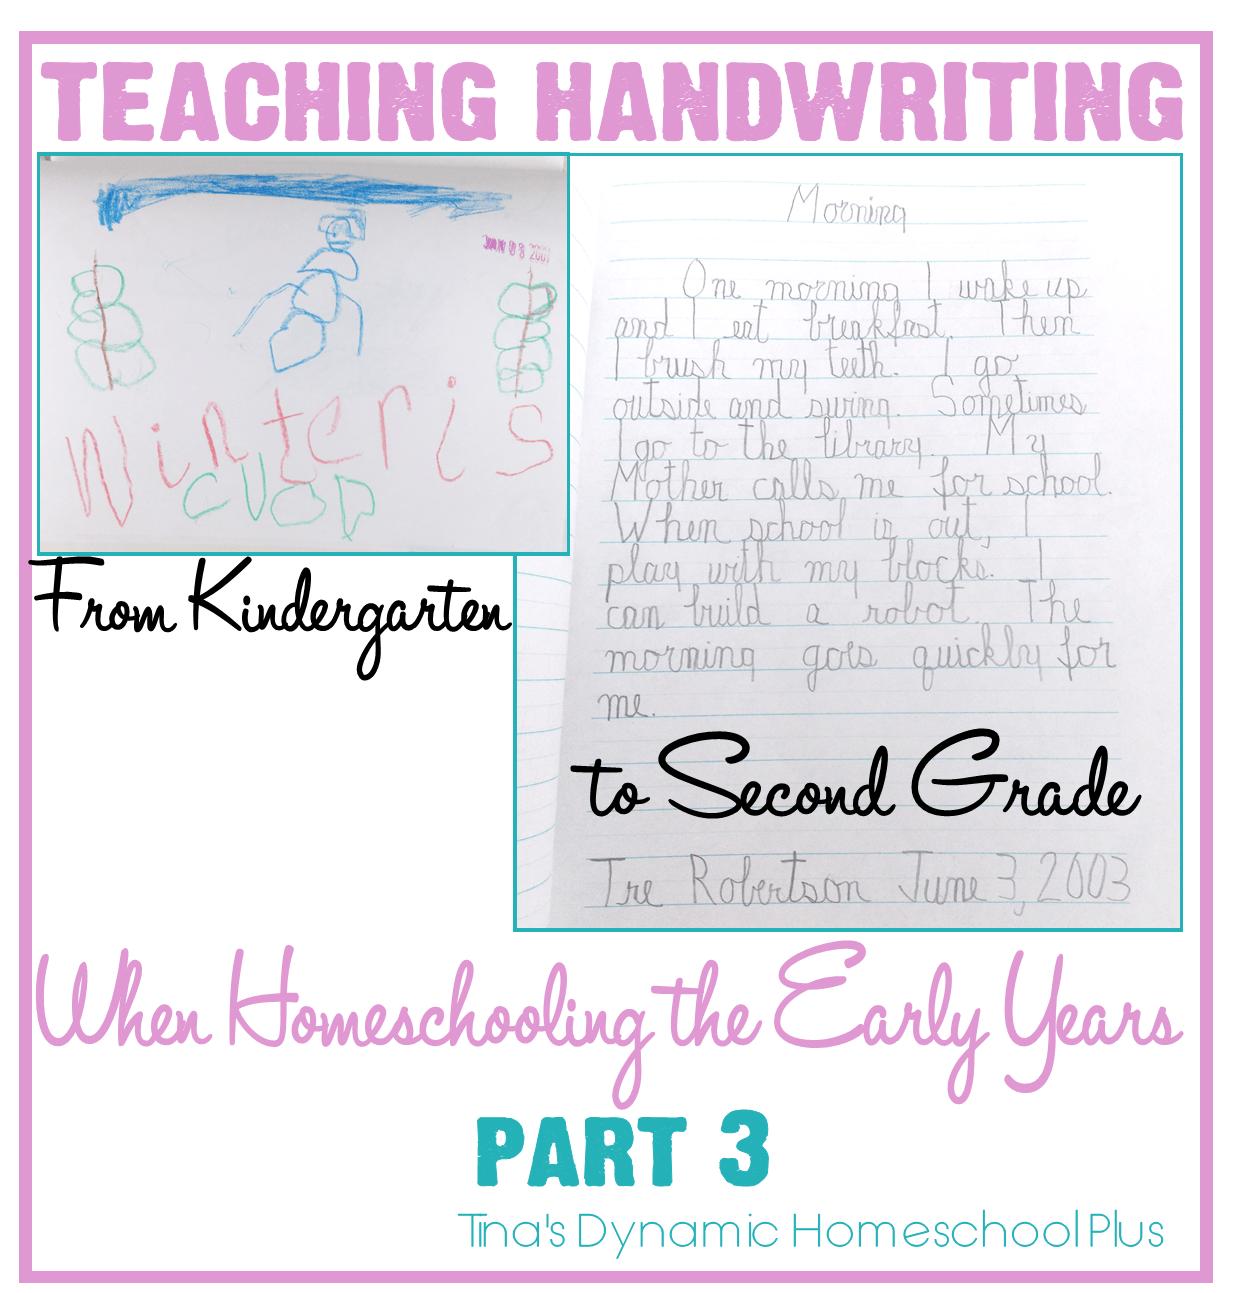 Teaching Handwriting When Homeschooling The Early Years